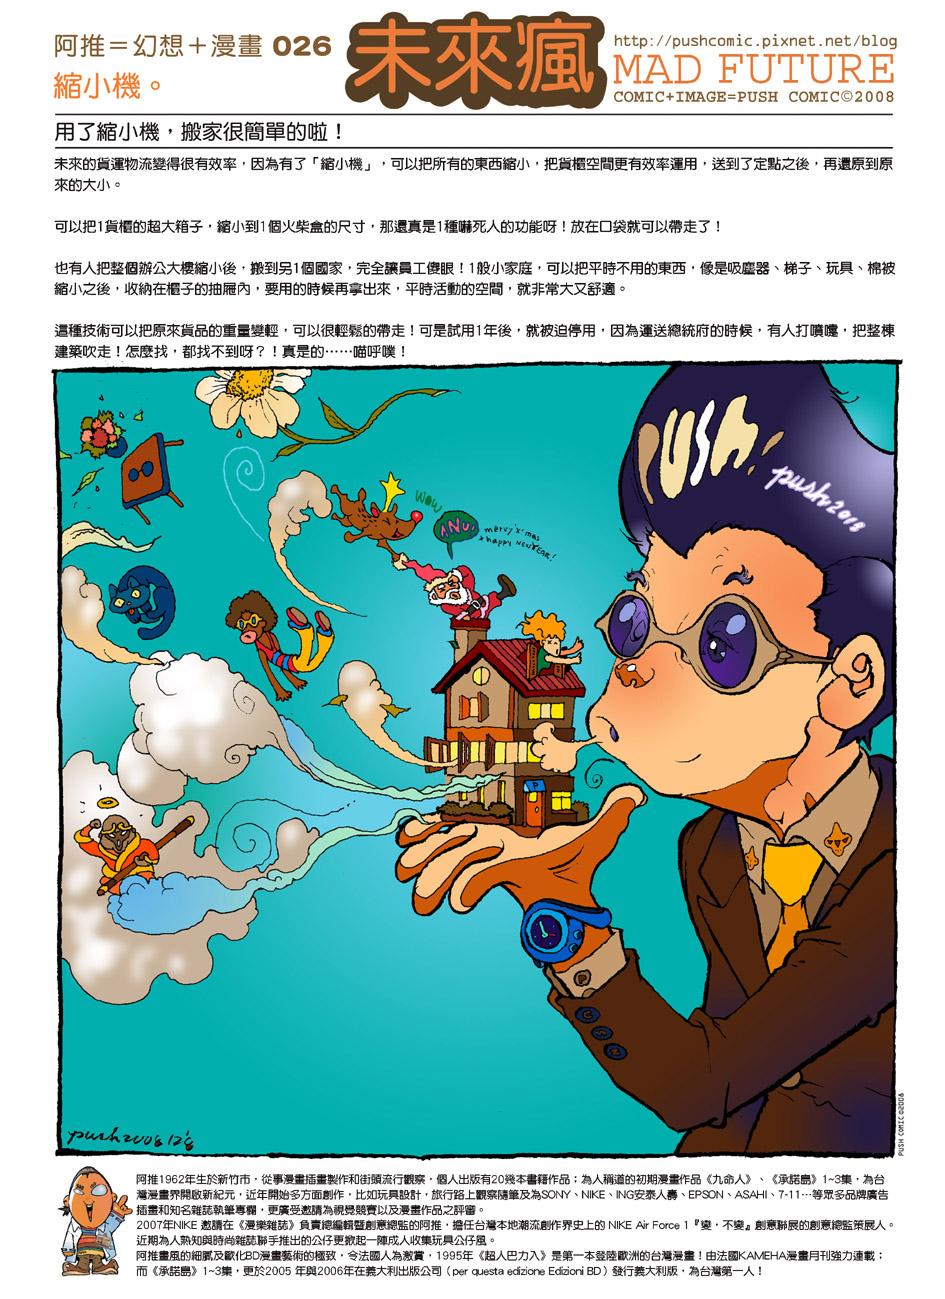 Ming-026-MF-byPUSH-S.jpg